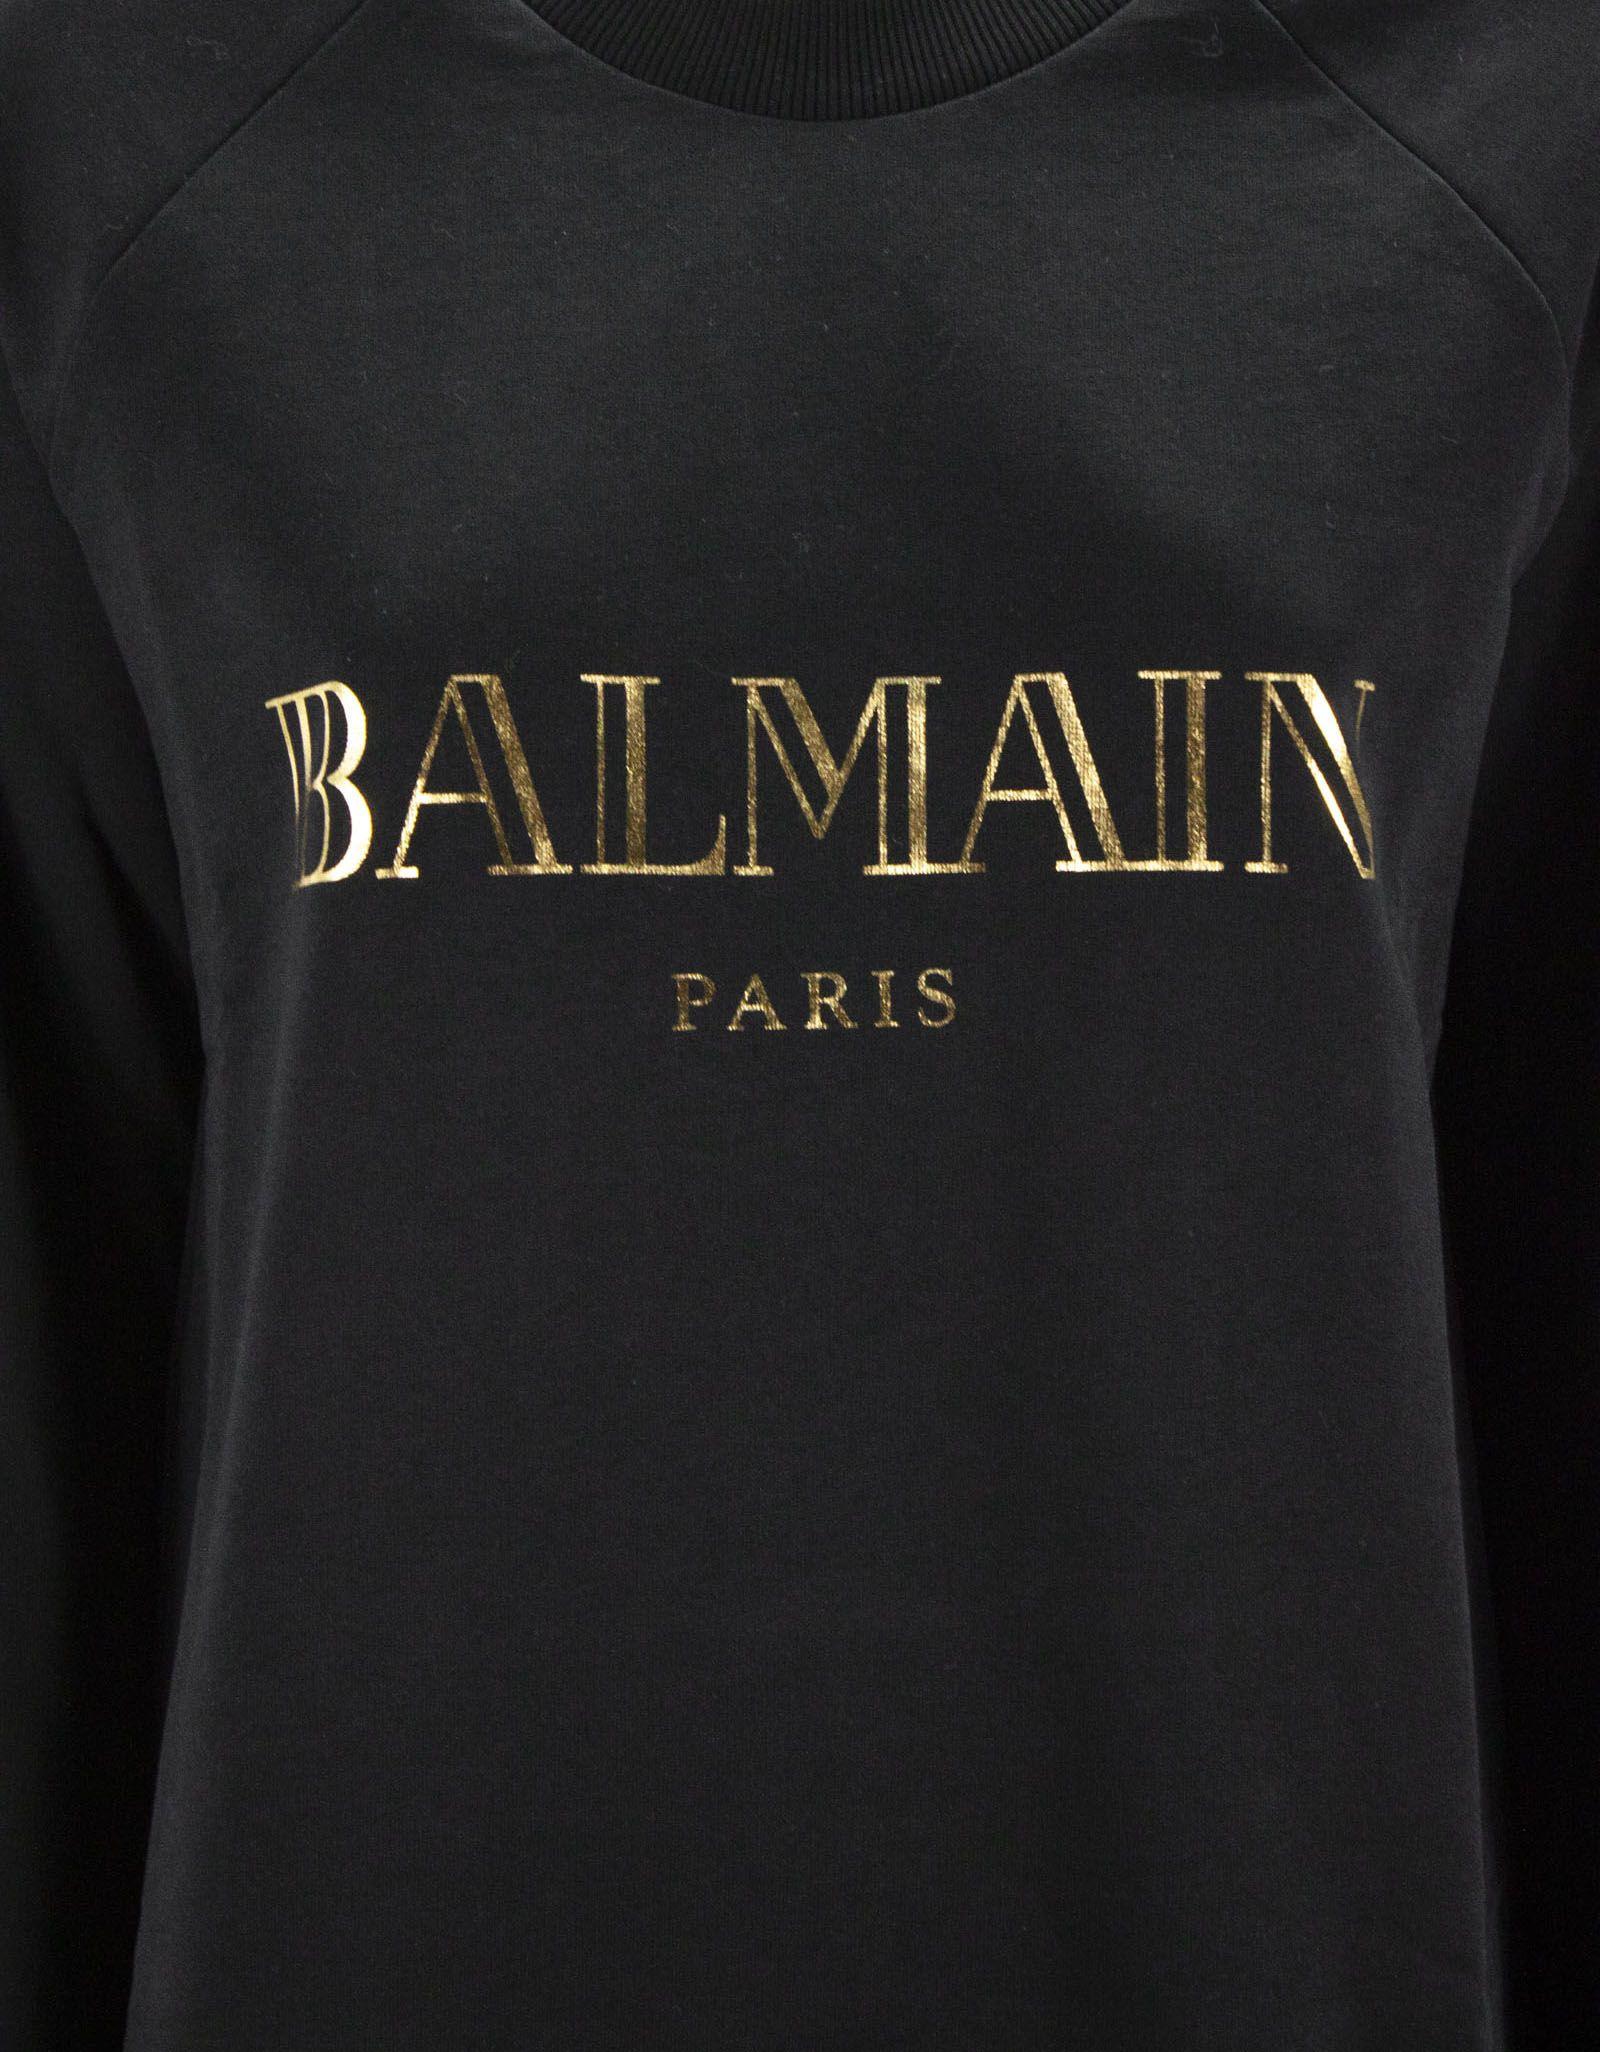 05c48bcb Balmain Balmain Black And Gold Cotton Sweatshirt - Nero - 10832143 ...